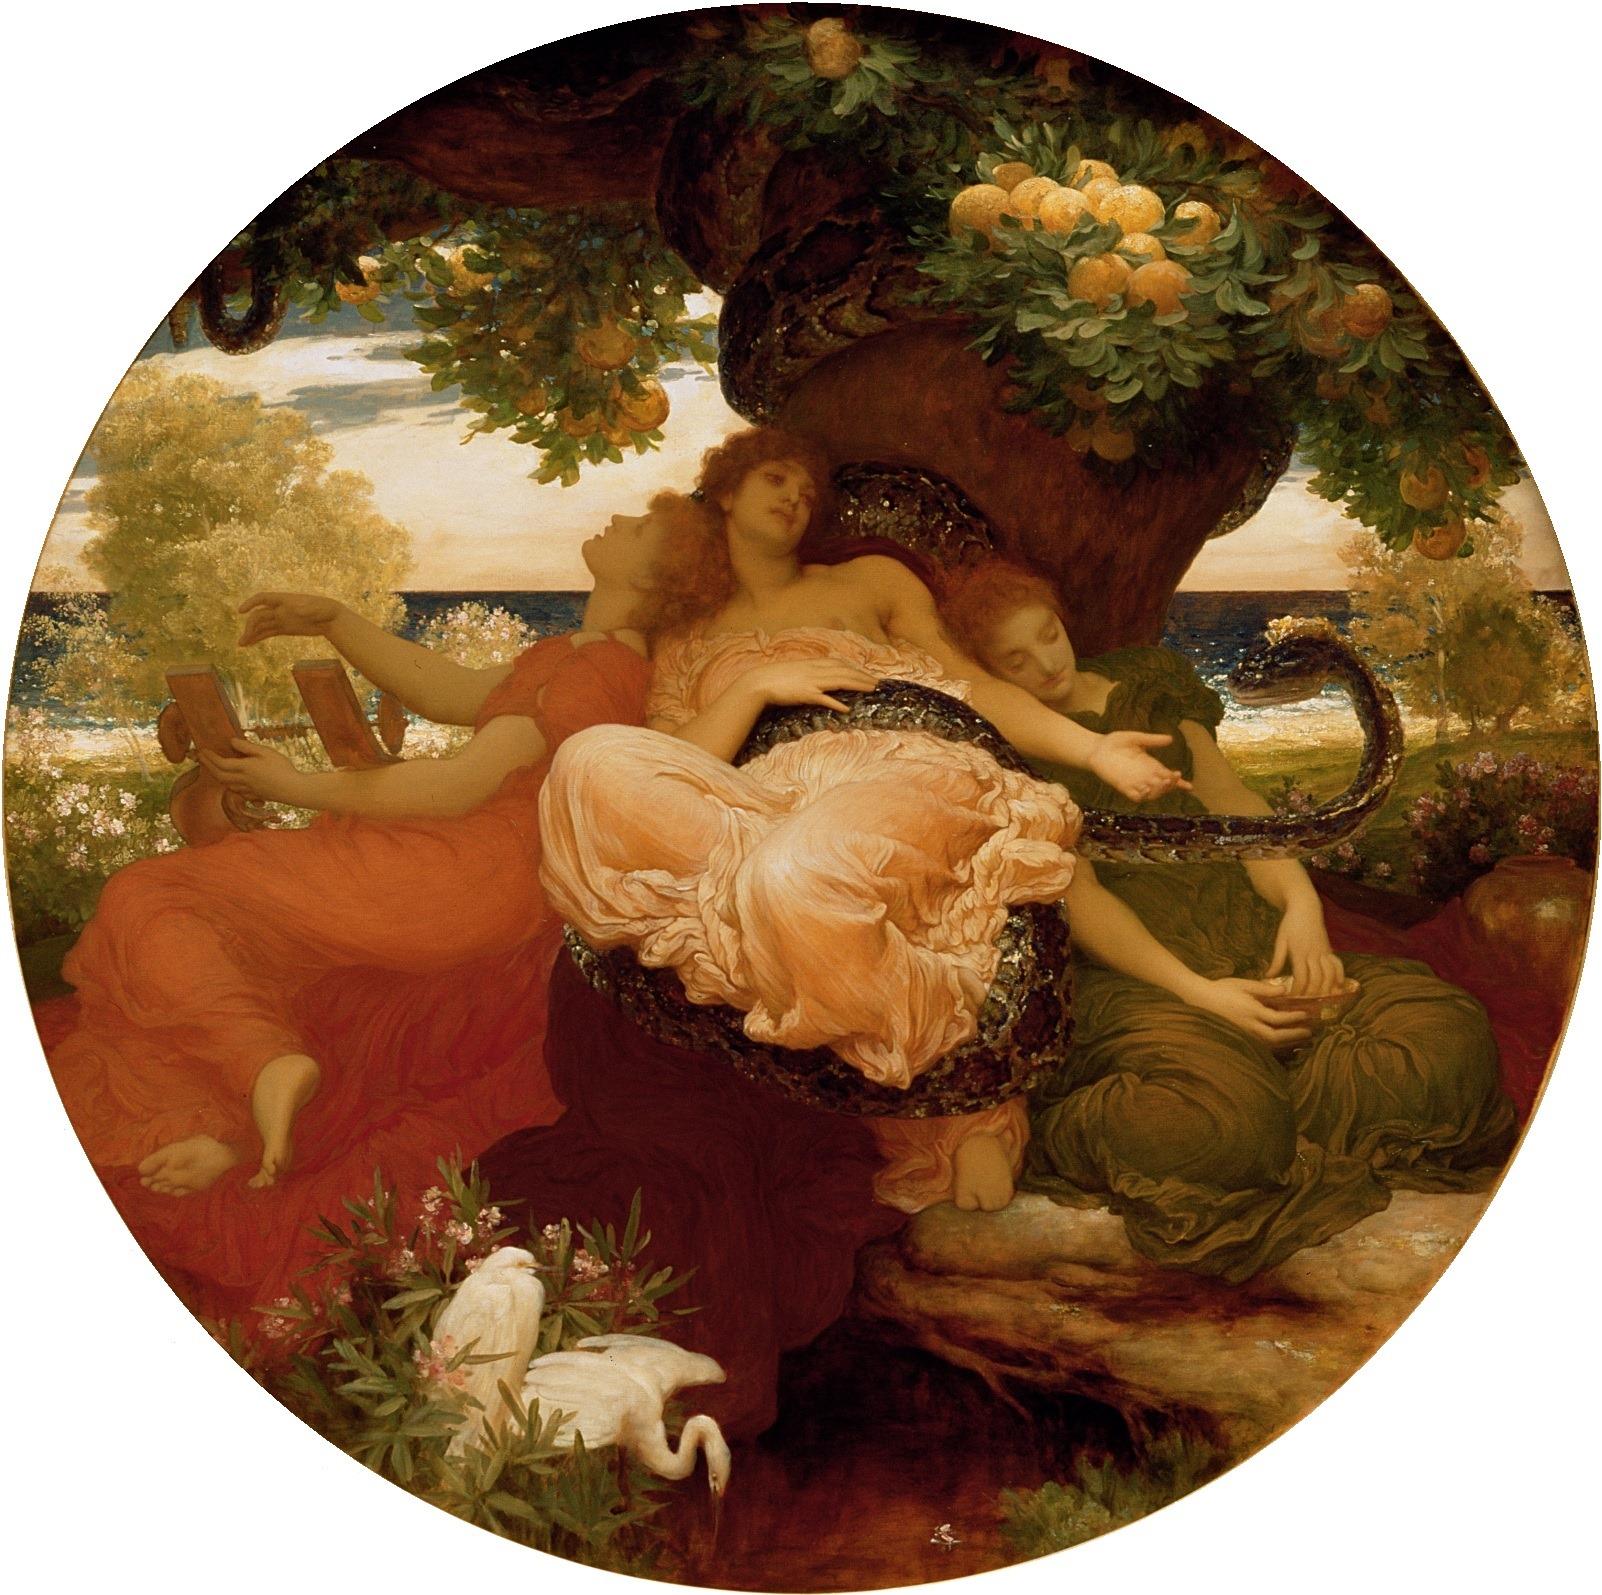 Frederic_Leighton_-_The_Garden_of_the_Hesperides